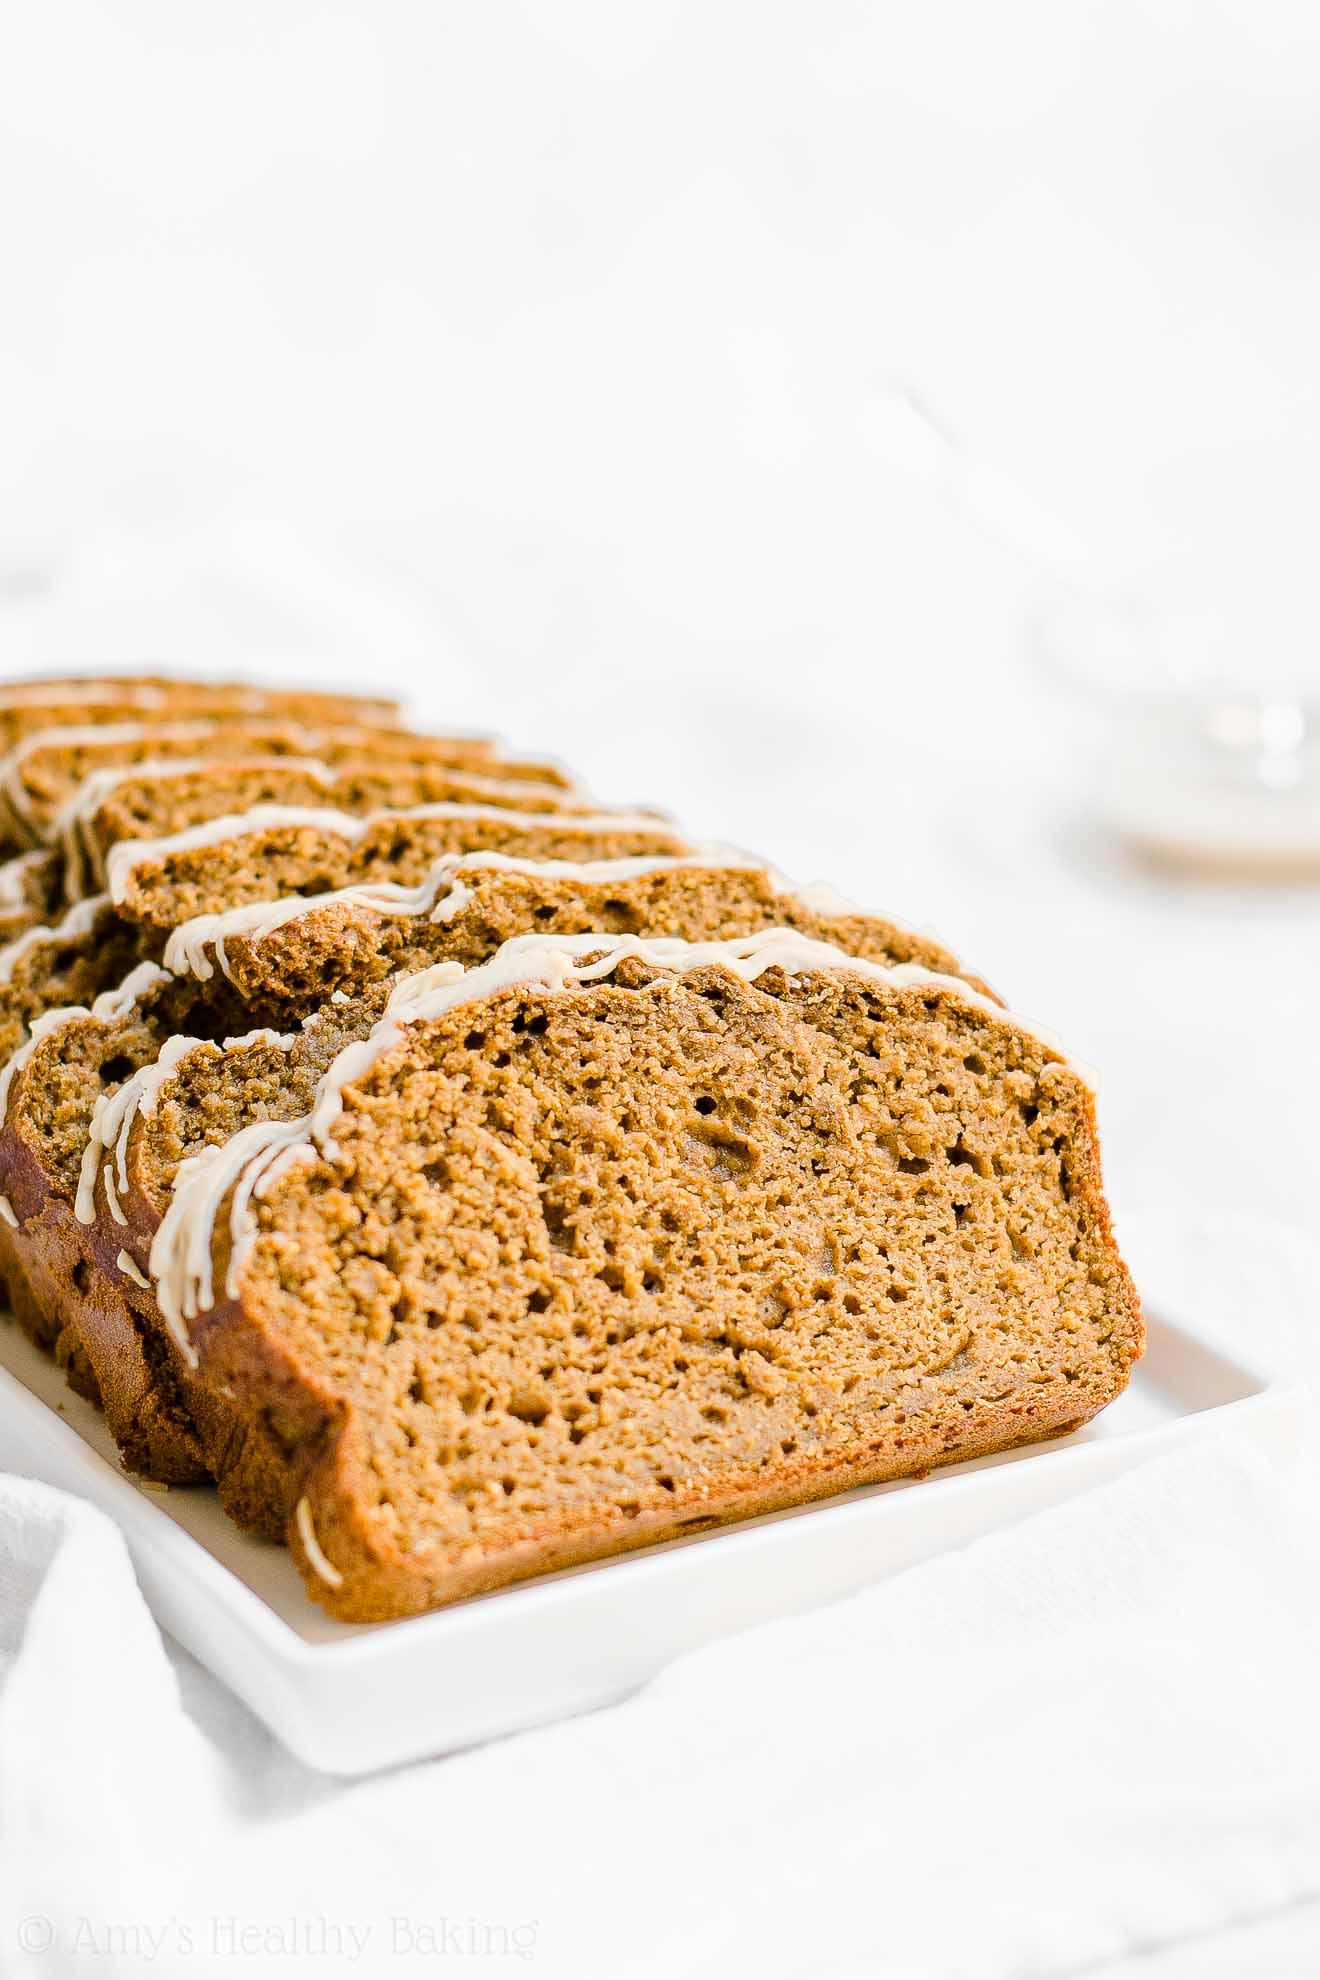 Healthy Gluten Free Low Calorie Pumpkin Spice Latte Pound Cake